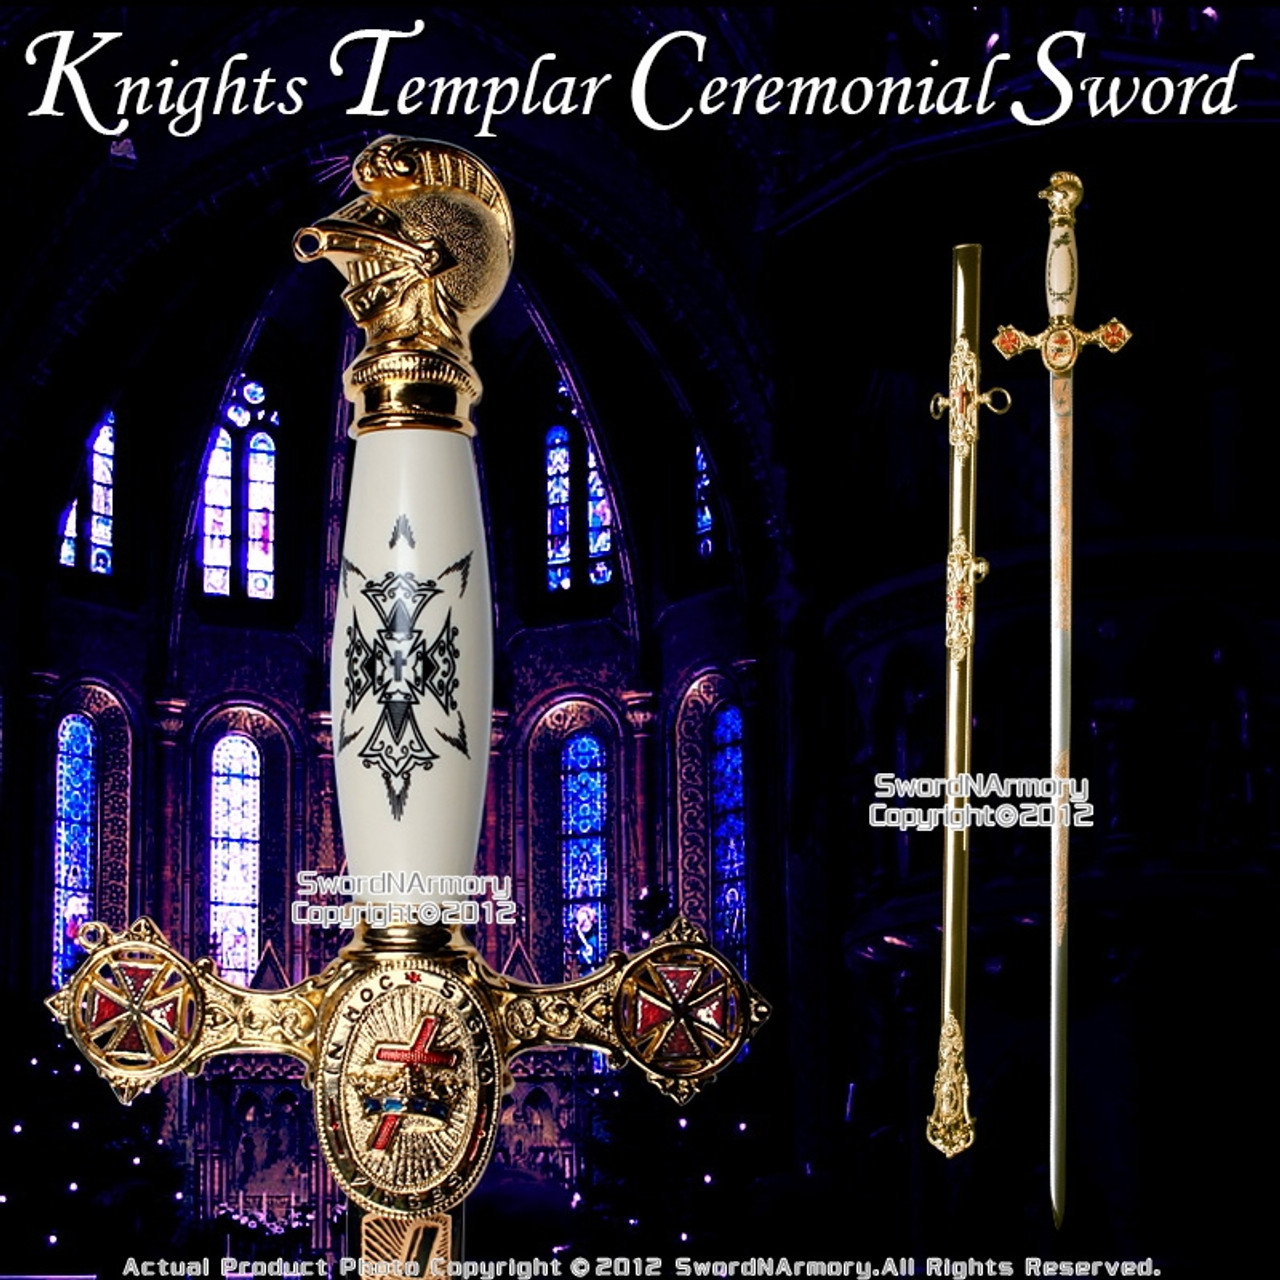 Knights Templar Freemason Masonic Ceremonial Sword Gold Regalia 3 Blade  Lengths